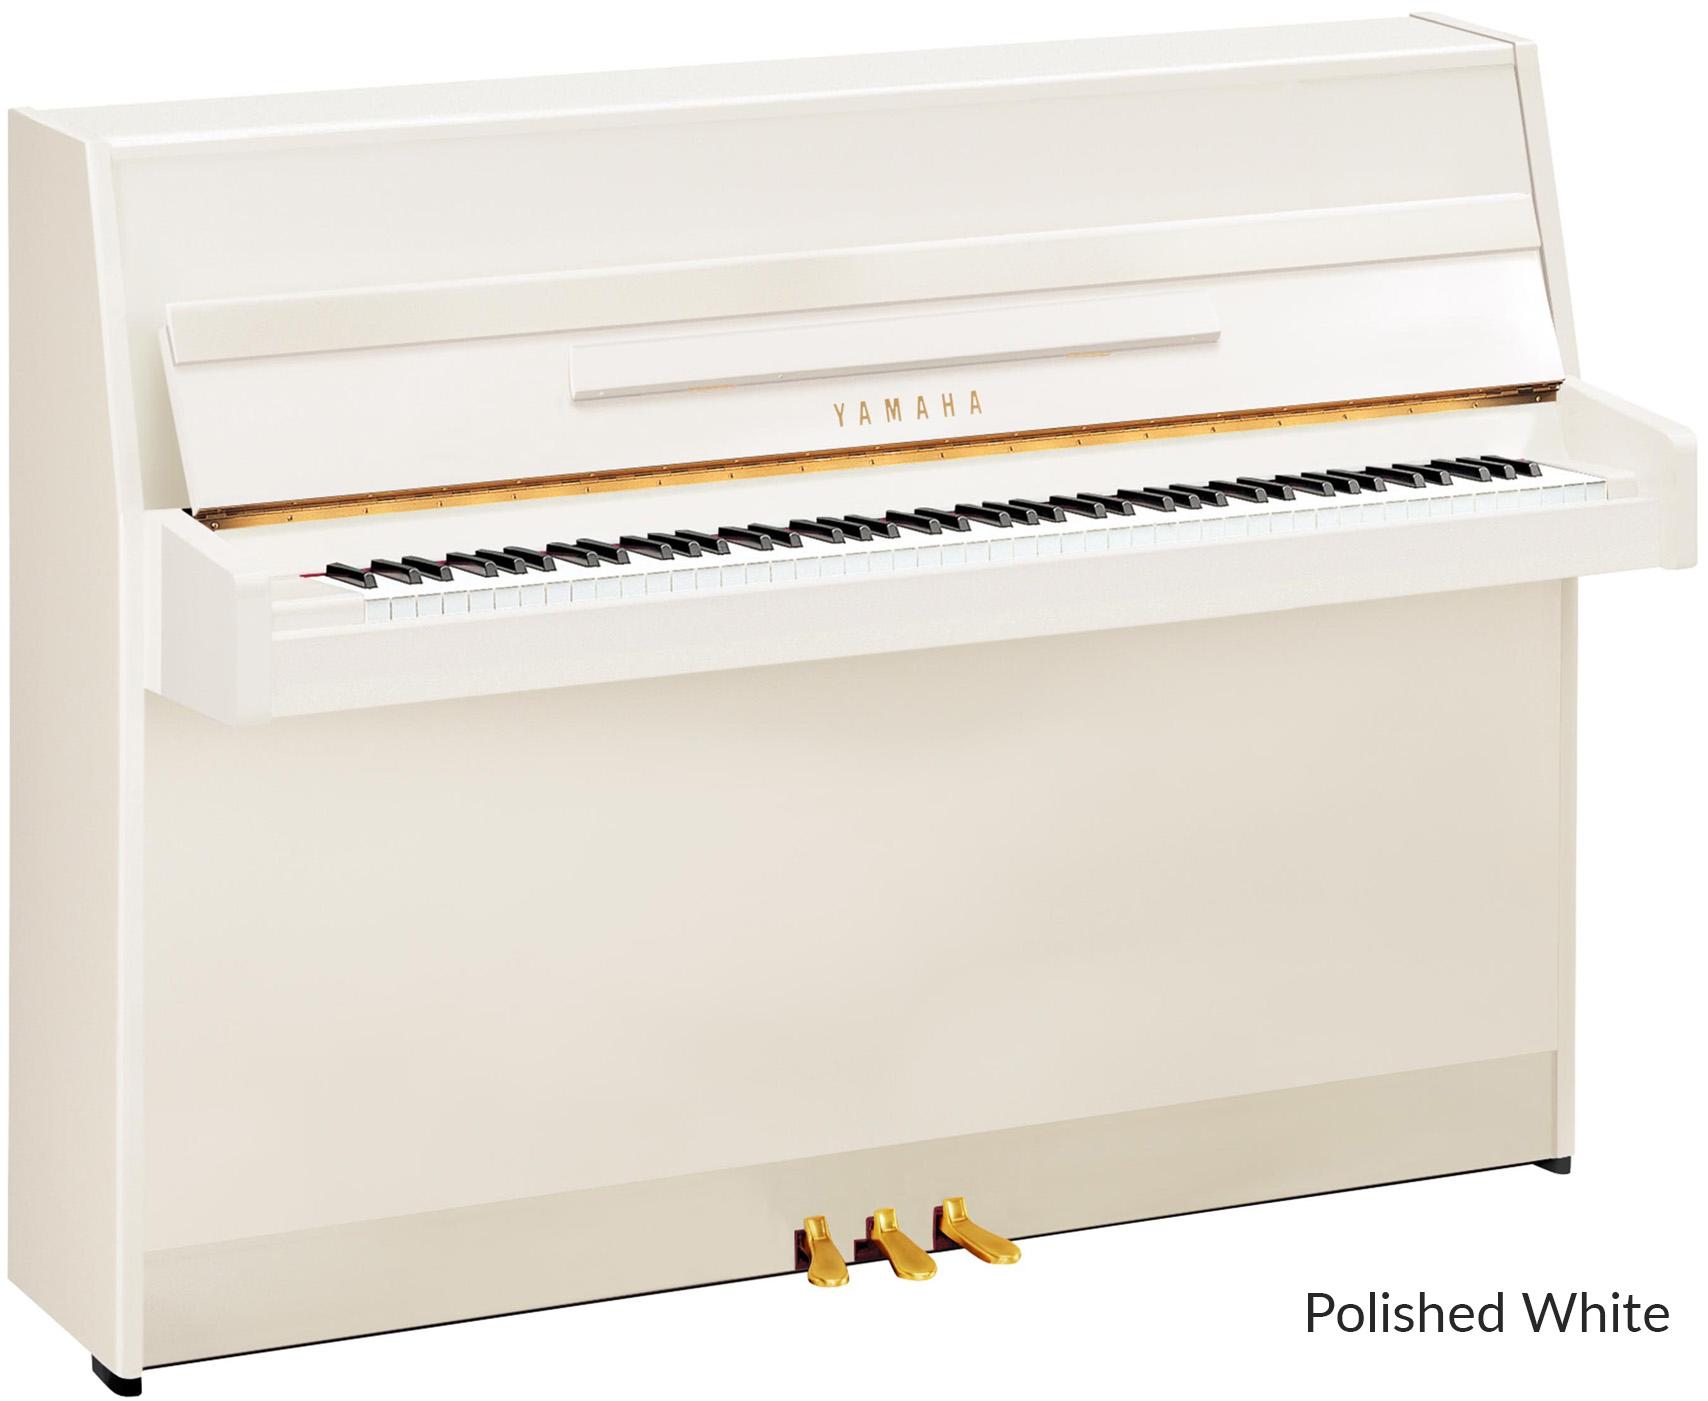 Yamaha b1 Upright Piano Various finishes available